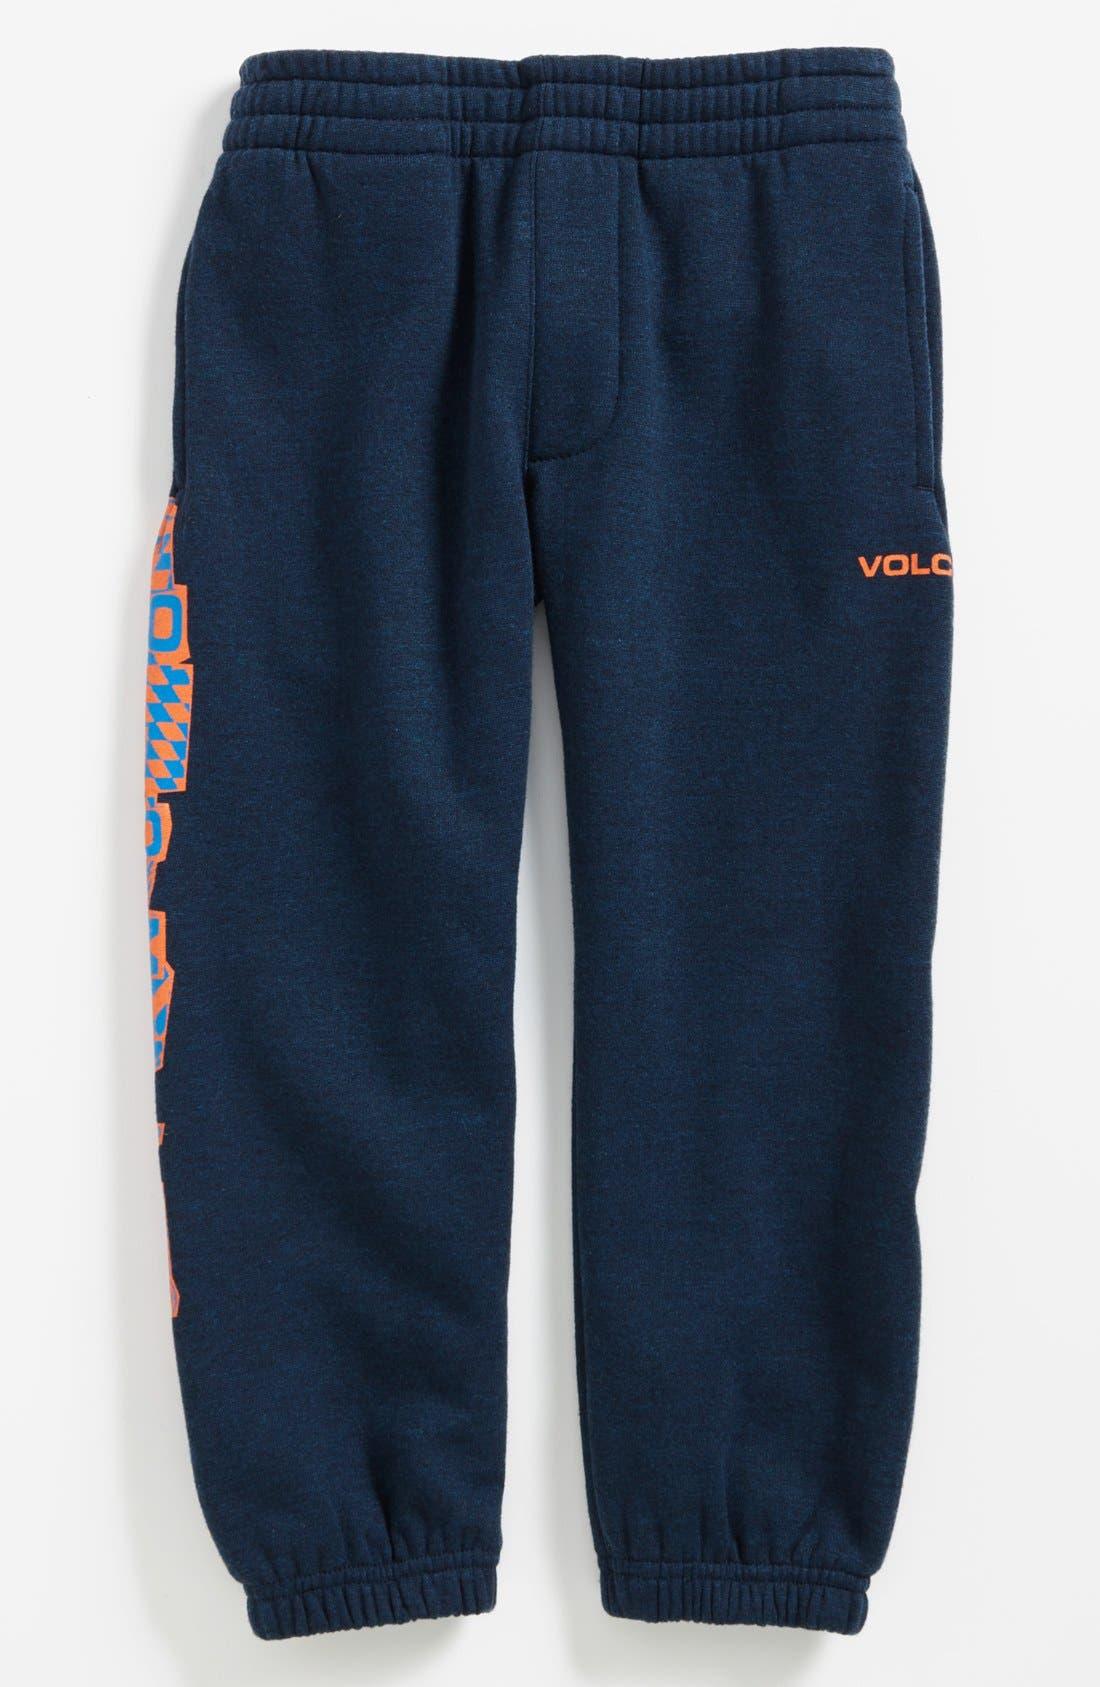 Main Image - Volcom 'Gigged' Sweatpants (Little Boys & Big Boys) (Online Only)